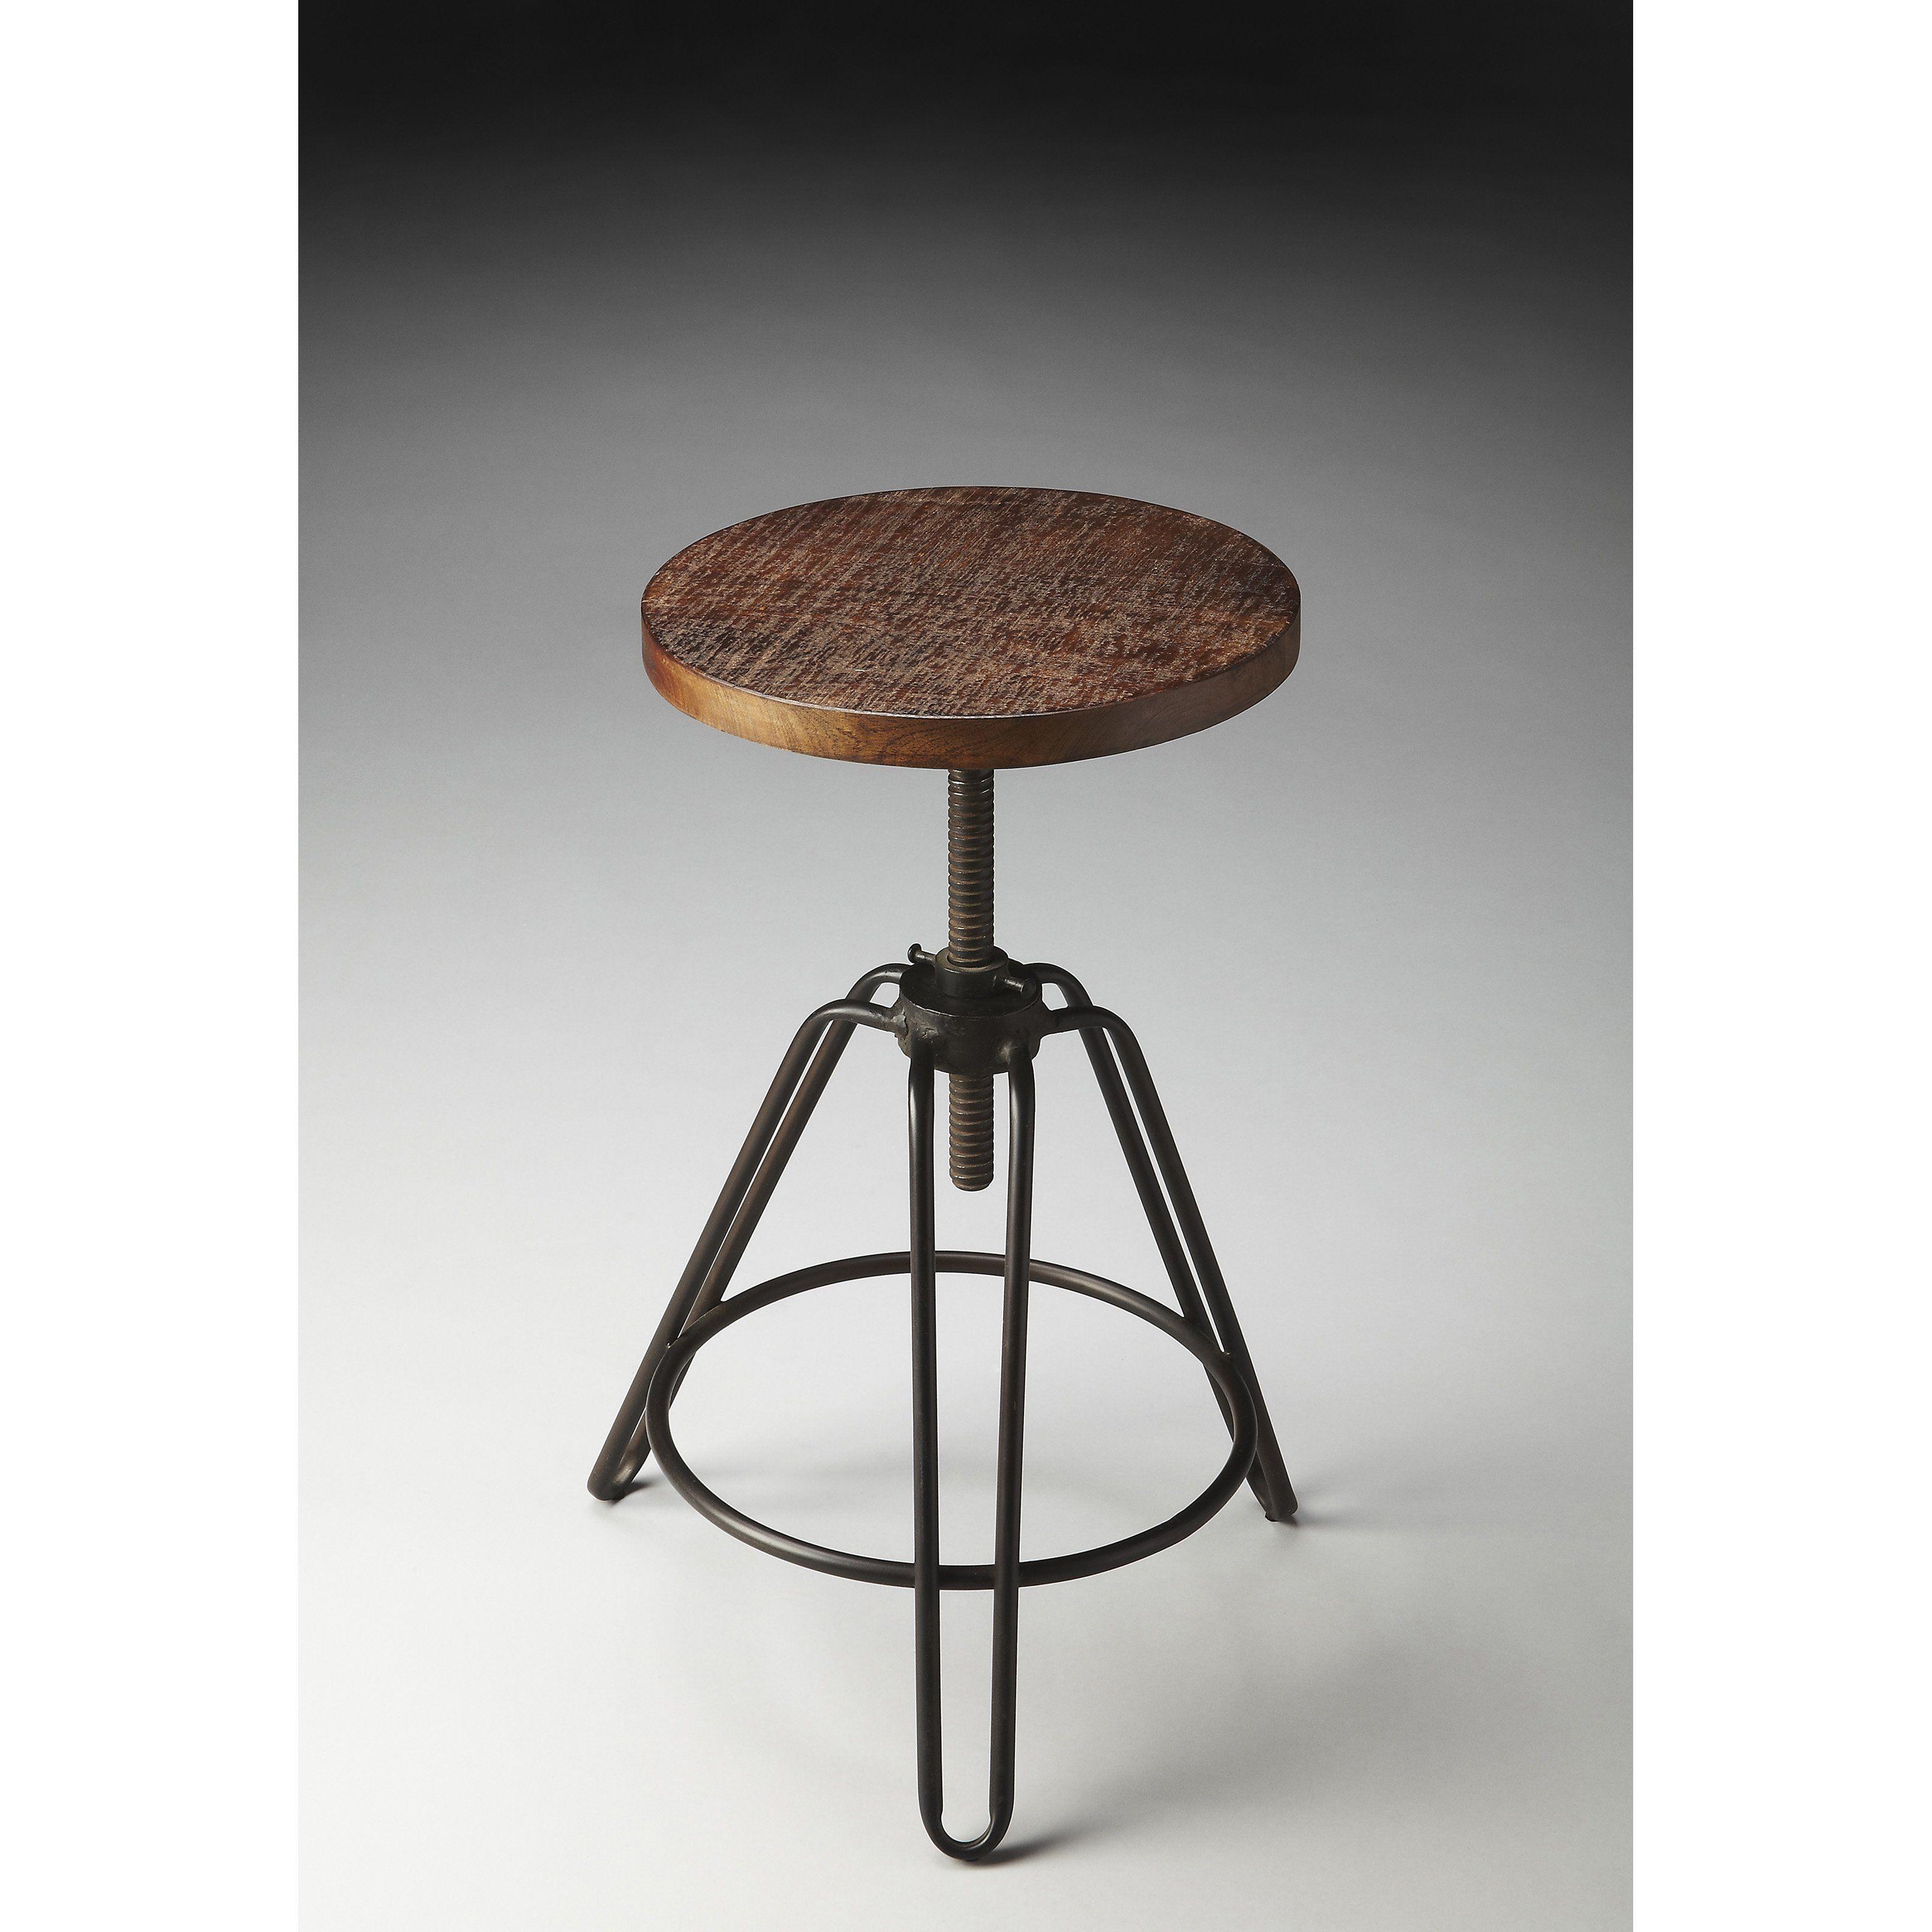 Peachy Butler Industrial Revolving 30 In Bar Stool 2050025 Machost Co Dining Chair Design Ideas Machostcouk